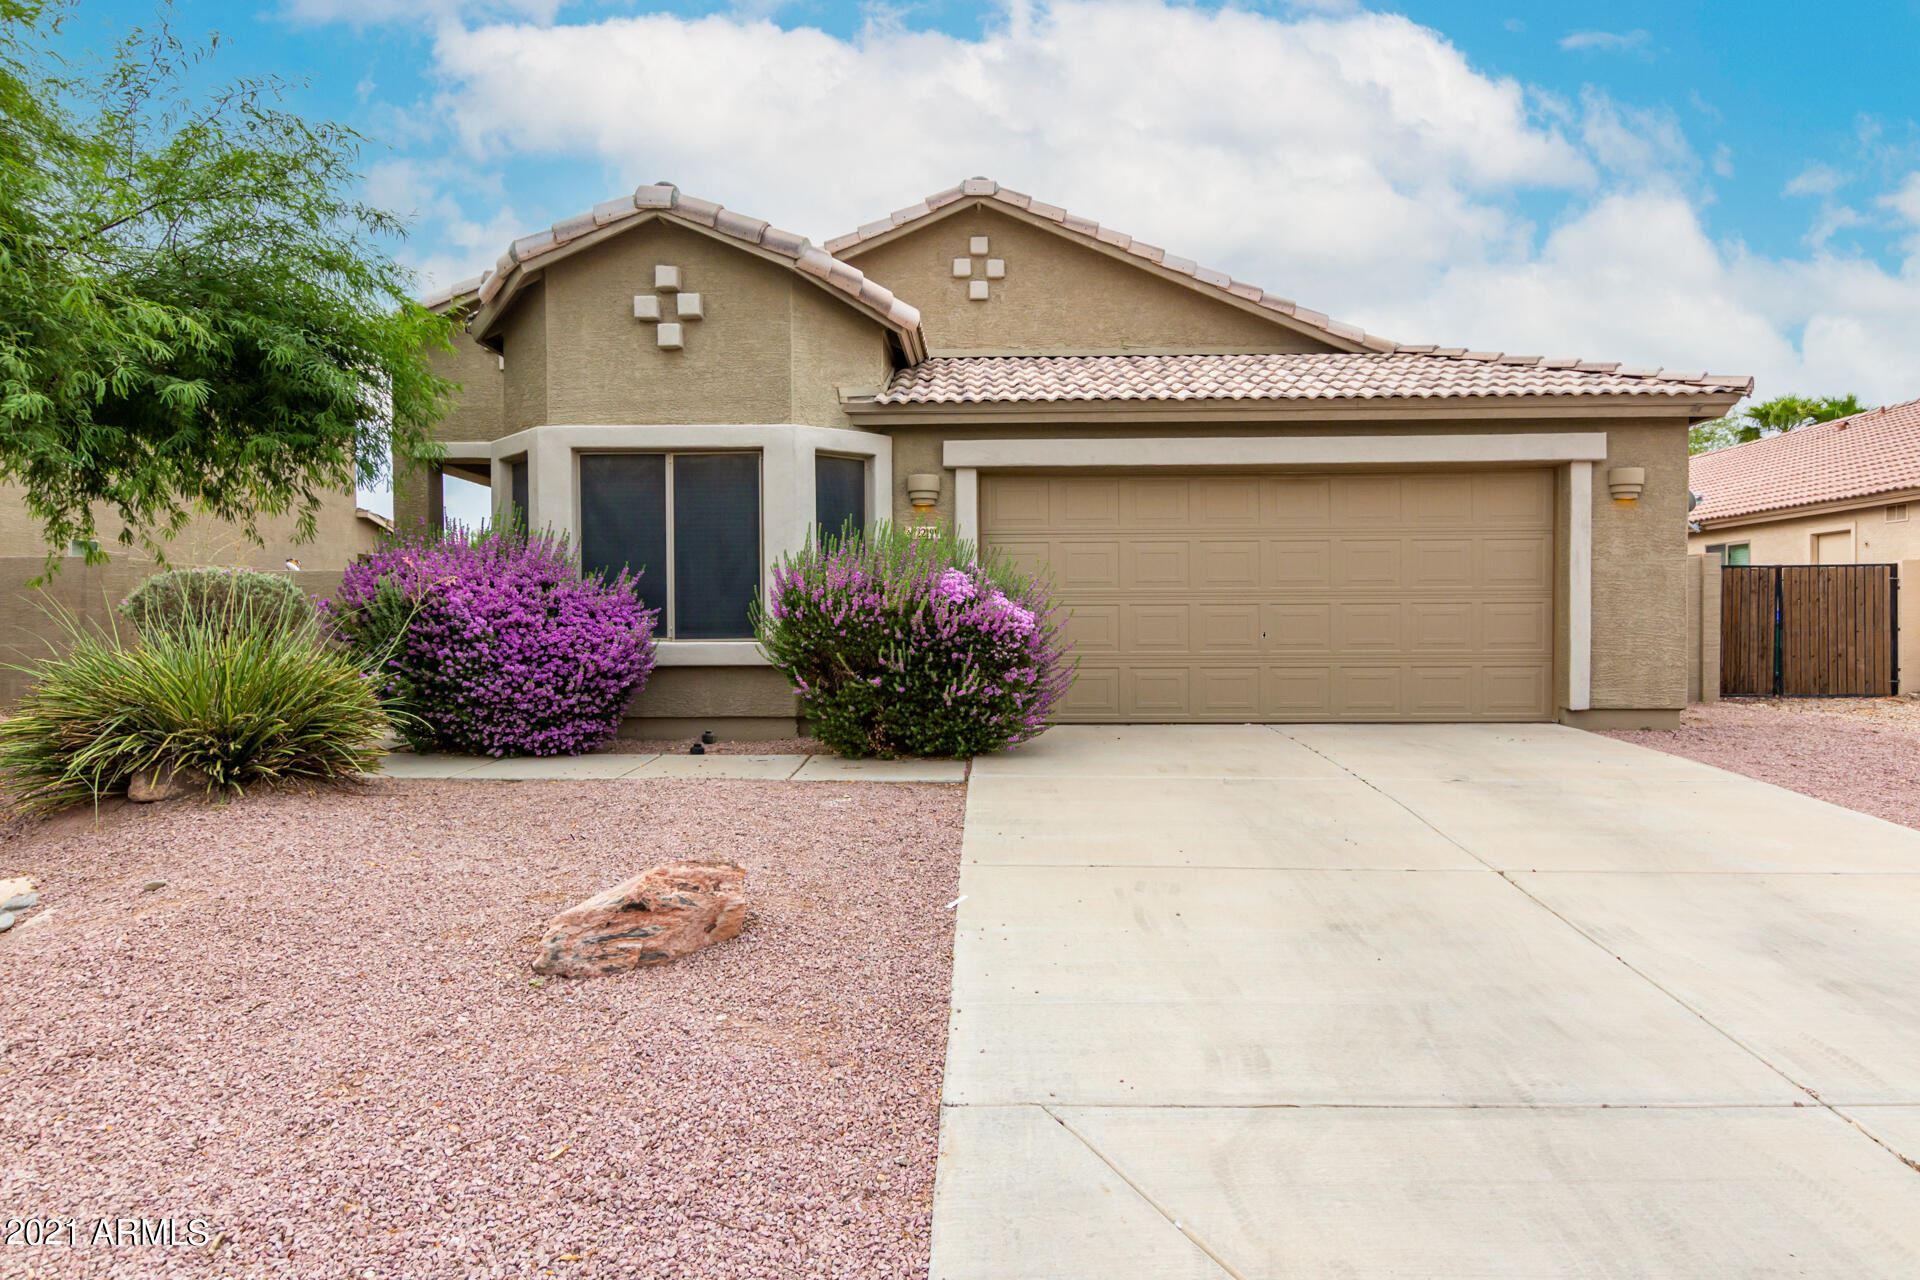 Photo for 22199 N BRADEN Road, Maricopa, AZ 85138 (MLS # 6267668)